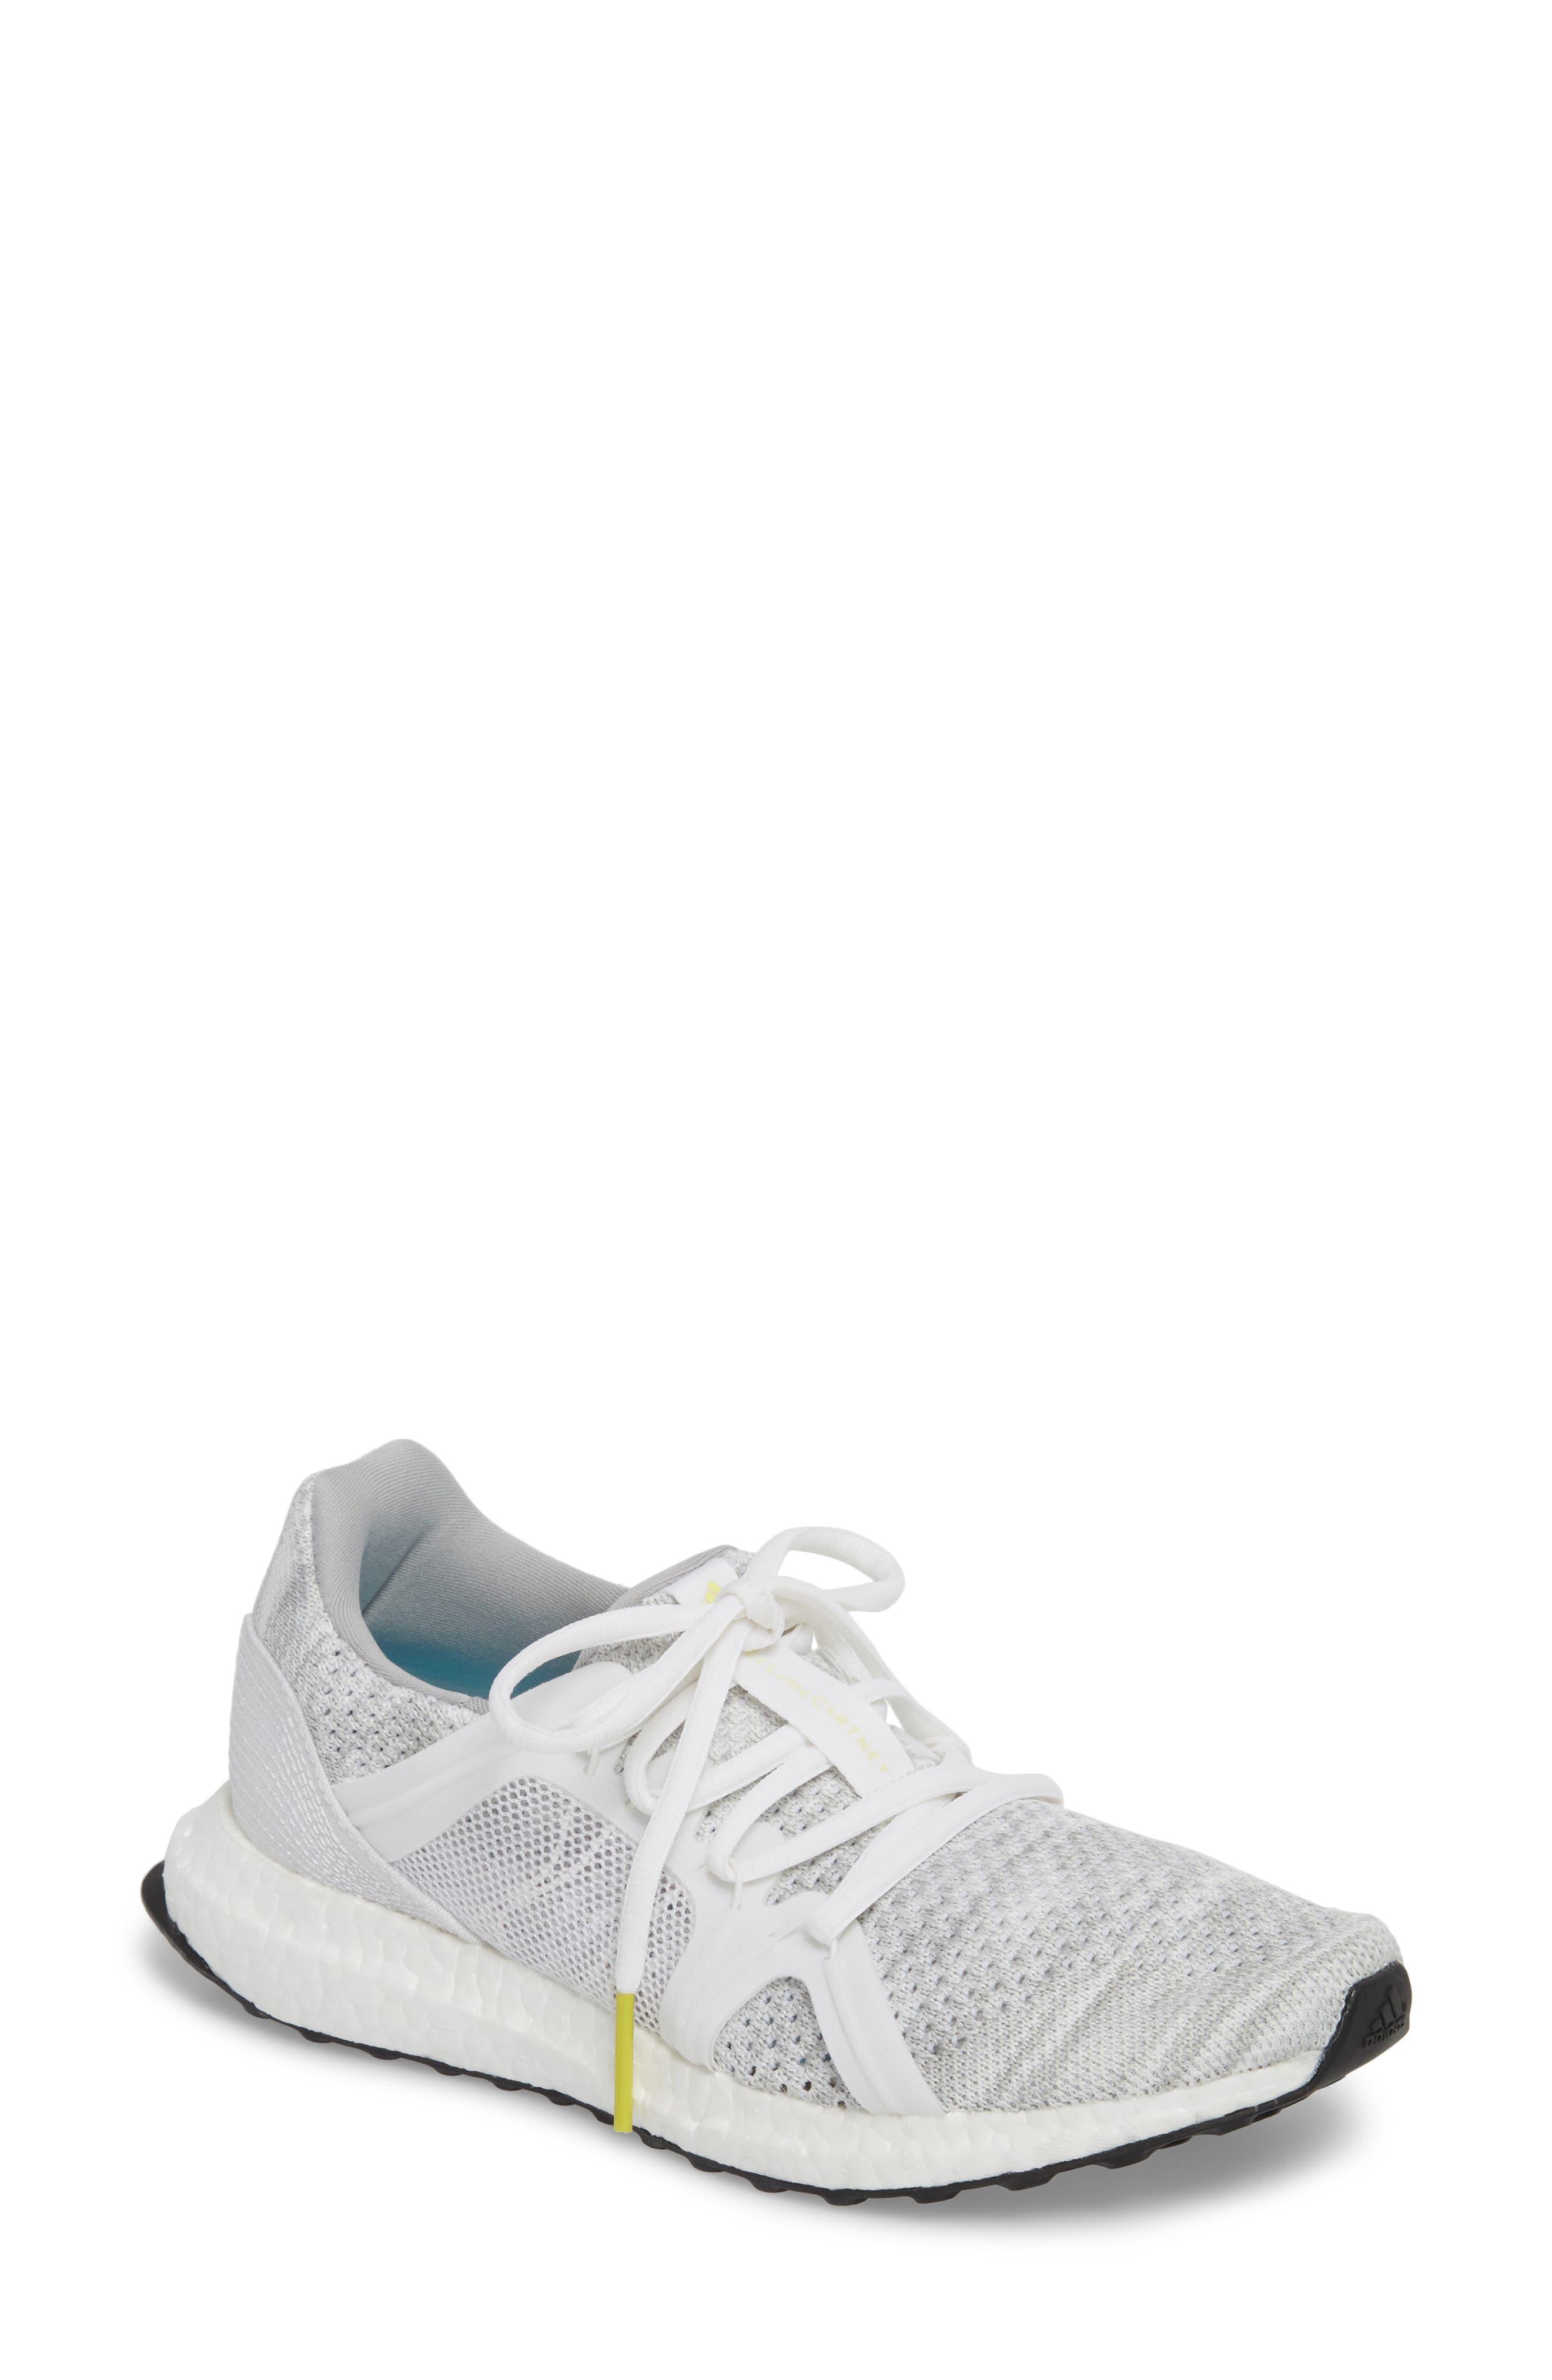 Alternate Image 1 Selected - adidas by Stella McCartney Ultraboost x Parley Running Shoe (Women)